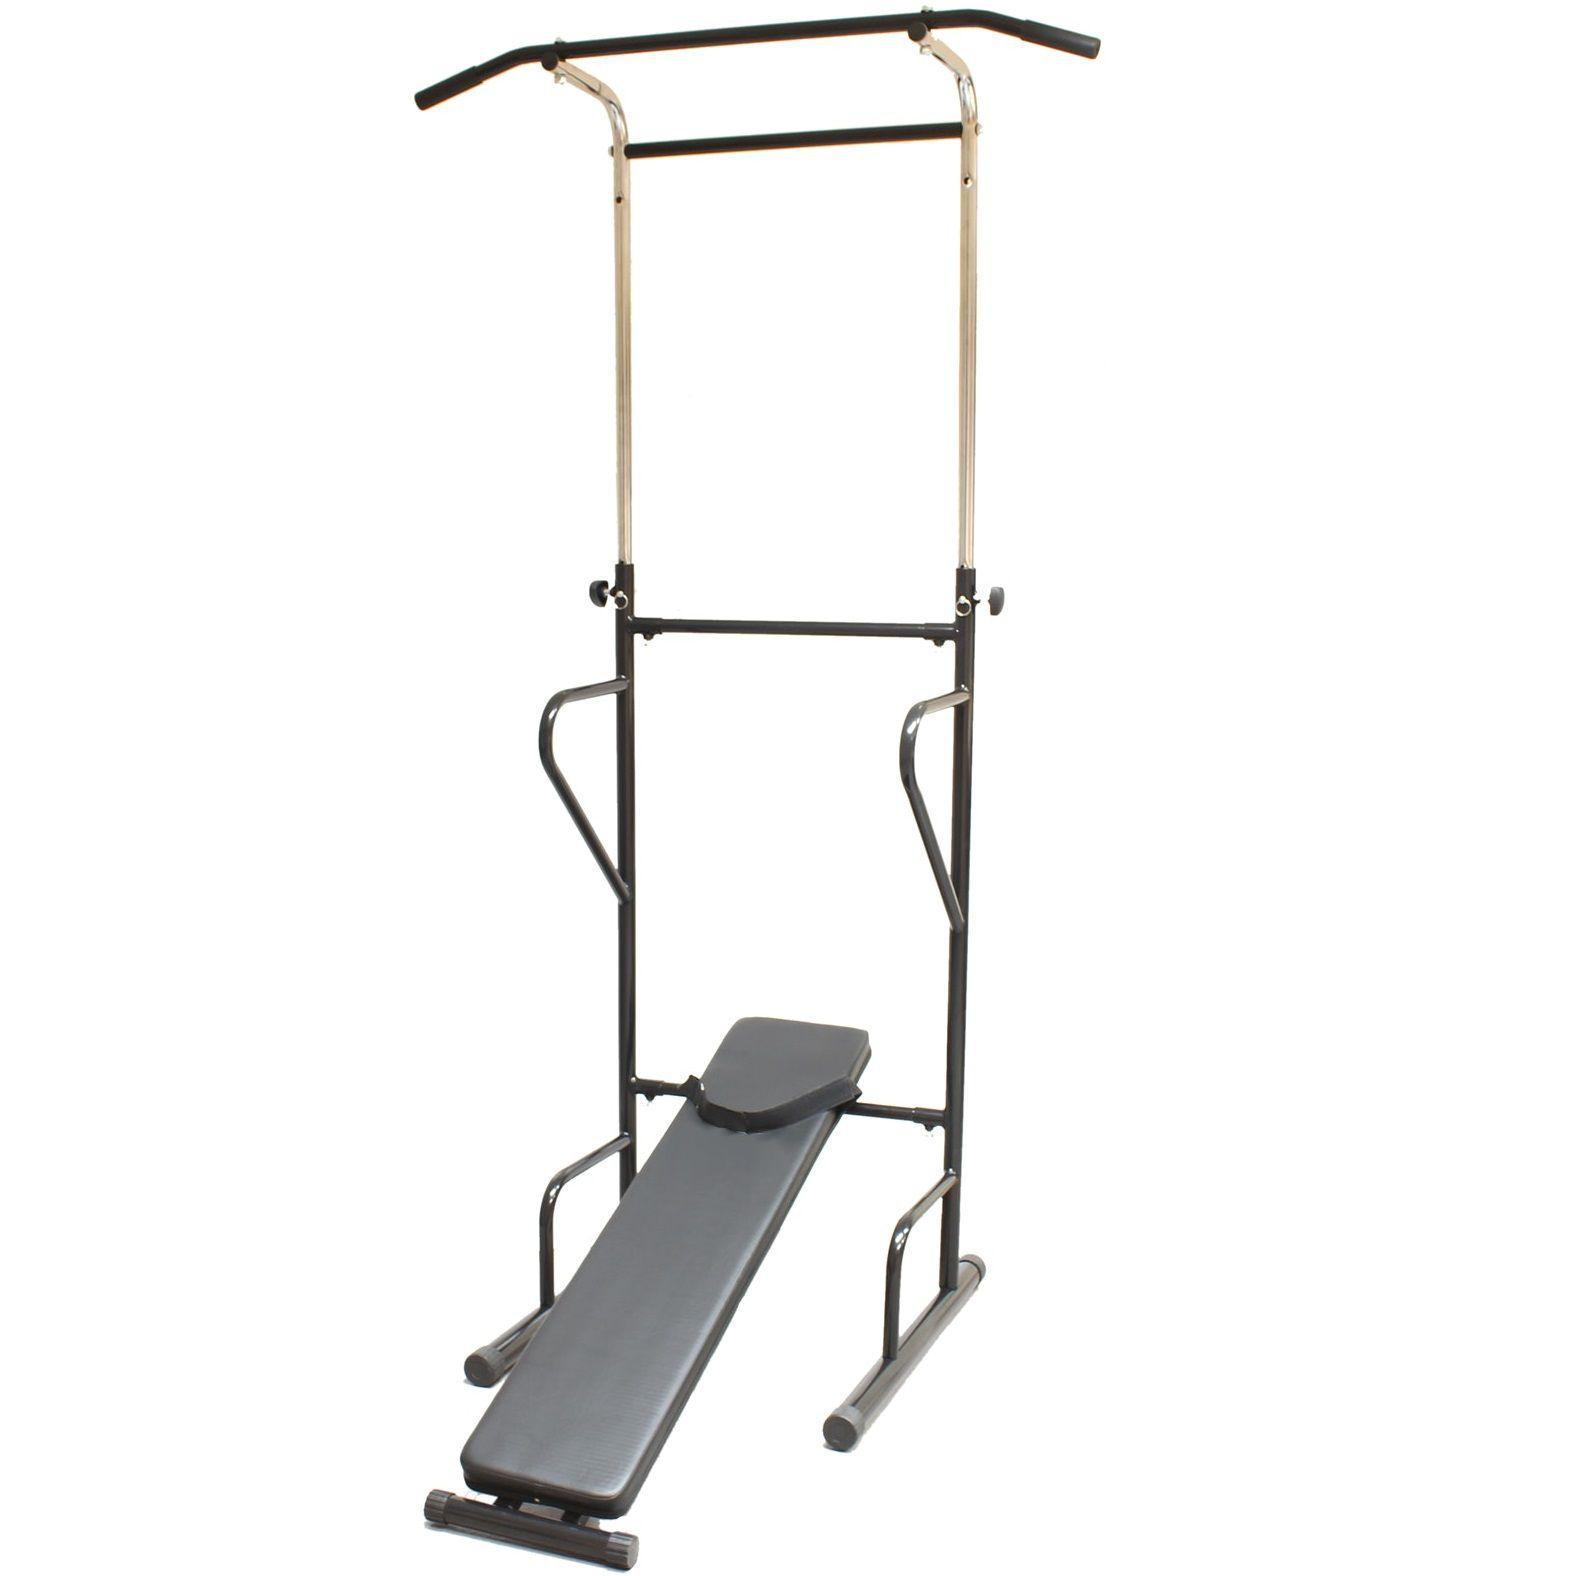 Expander & Widerstandsbänder New Multi Function Pull Up Dip Station for Indoor Home Gym Strength Training